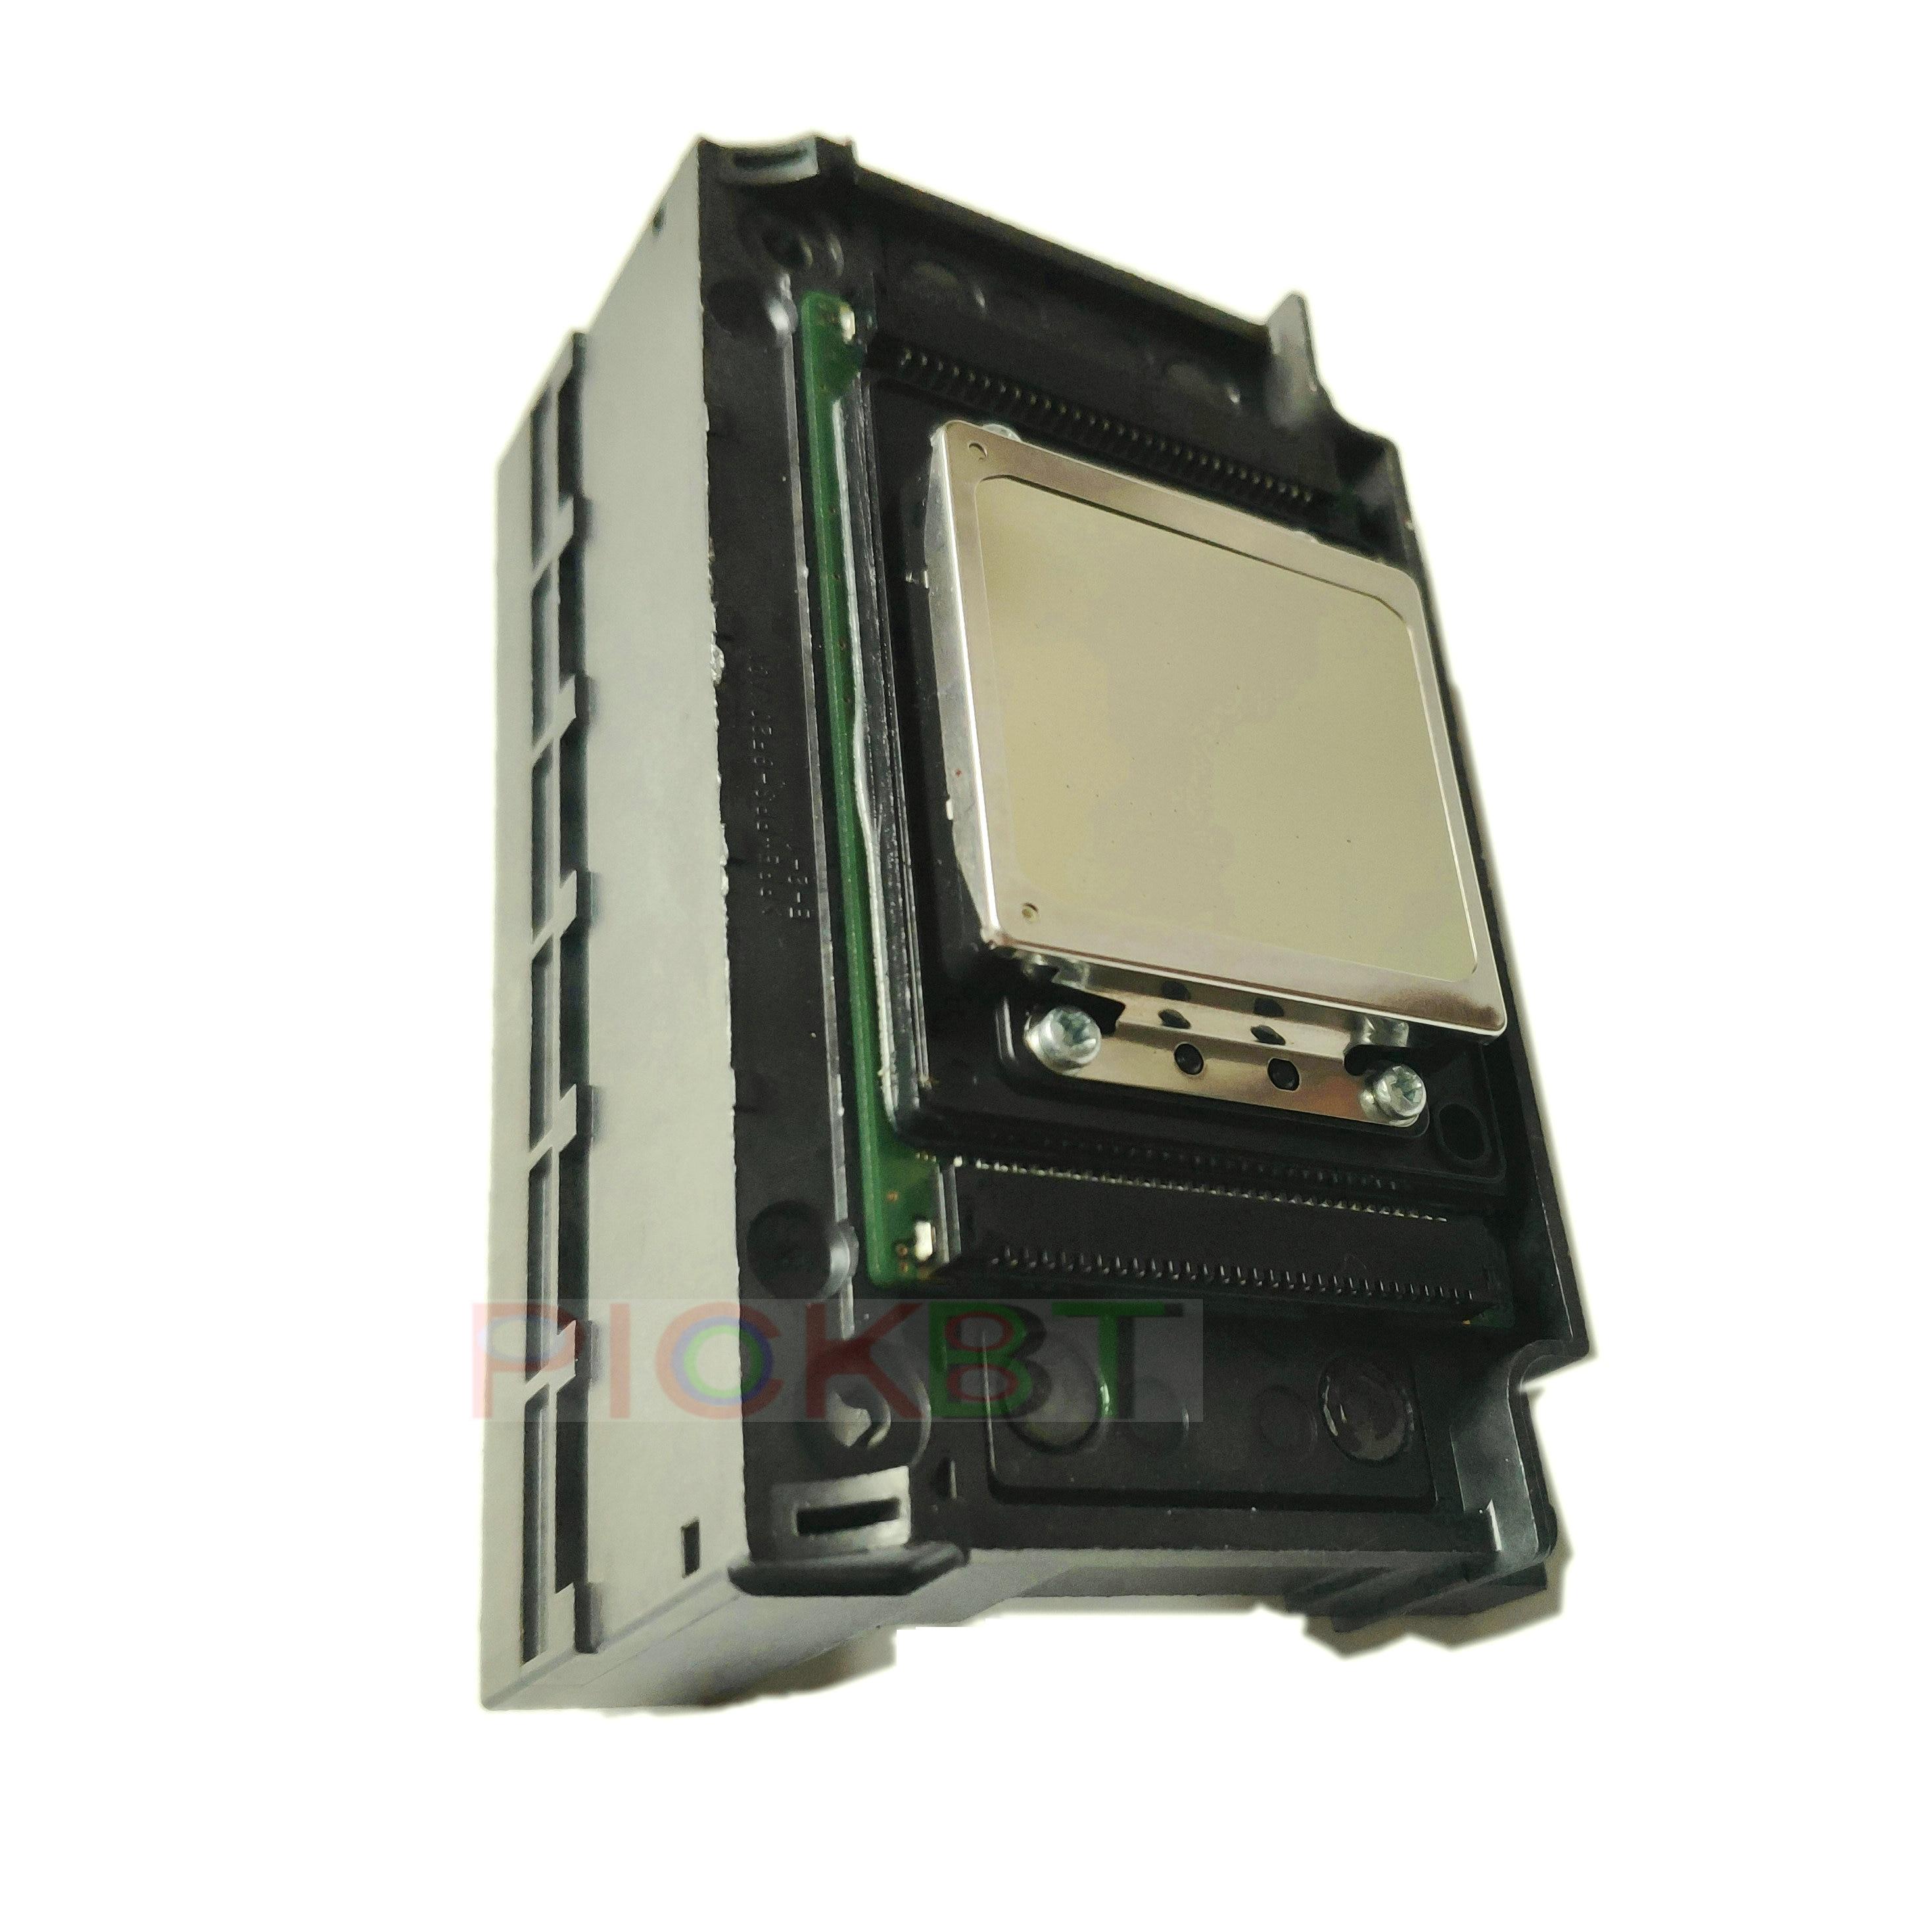 طباعة رئيس Printerhead epson epson إبسون لإبسون XP600 XP601 XP700 XP800 XP750 XP850 XP801 FA09050 FA09030